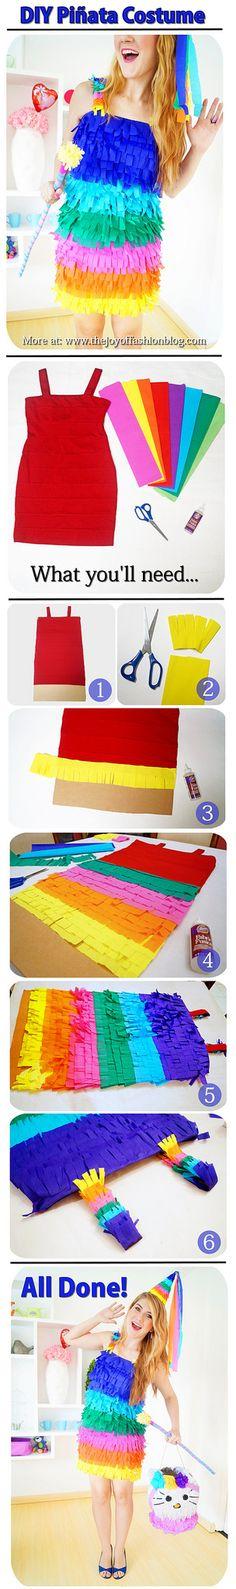 Easy Piñata Costume #halloween #costume #diy #craft